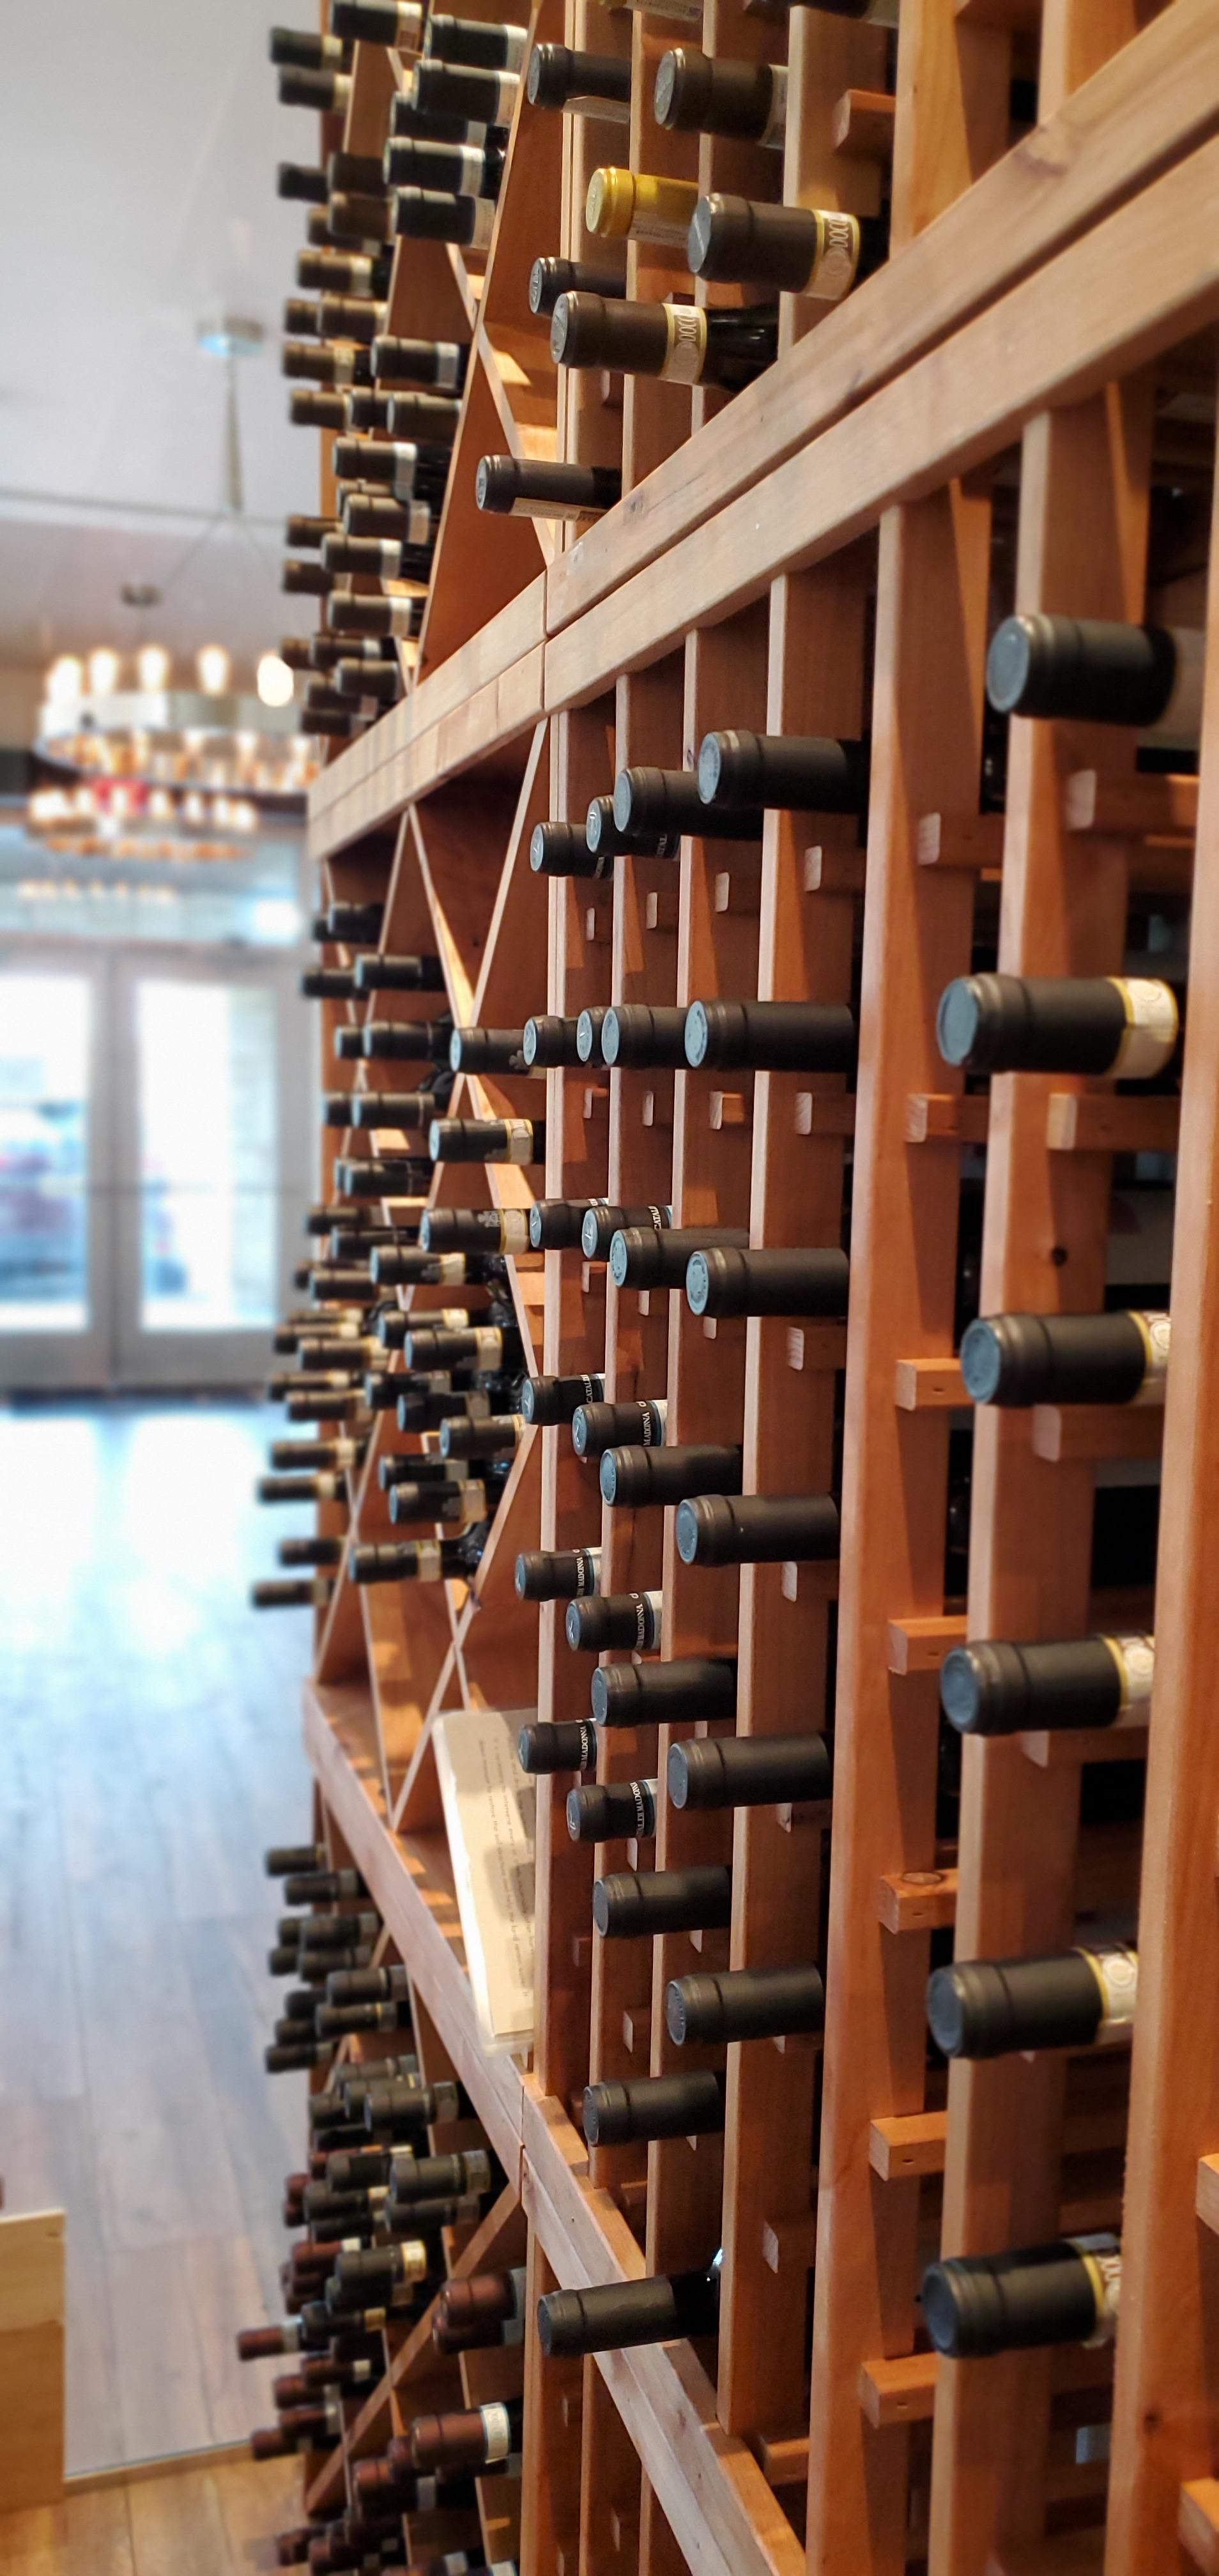 Westlake Wine Bar offers 150 European-leaning wines